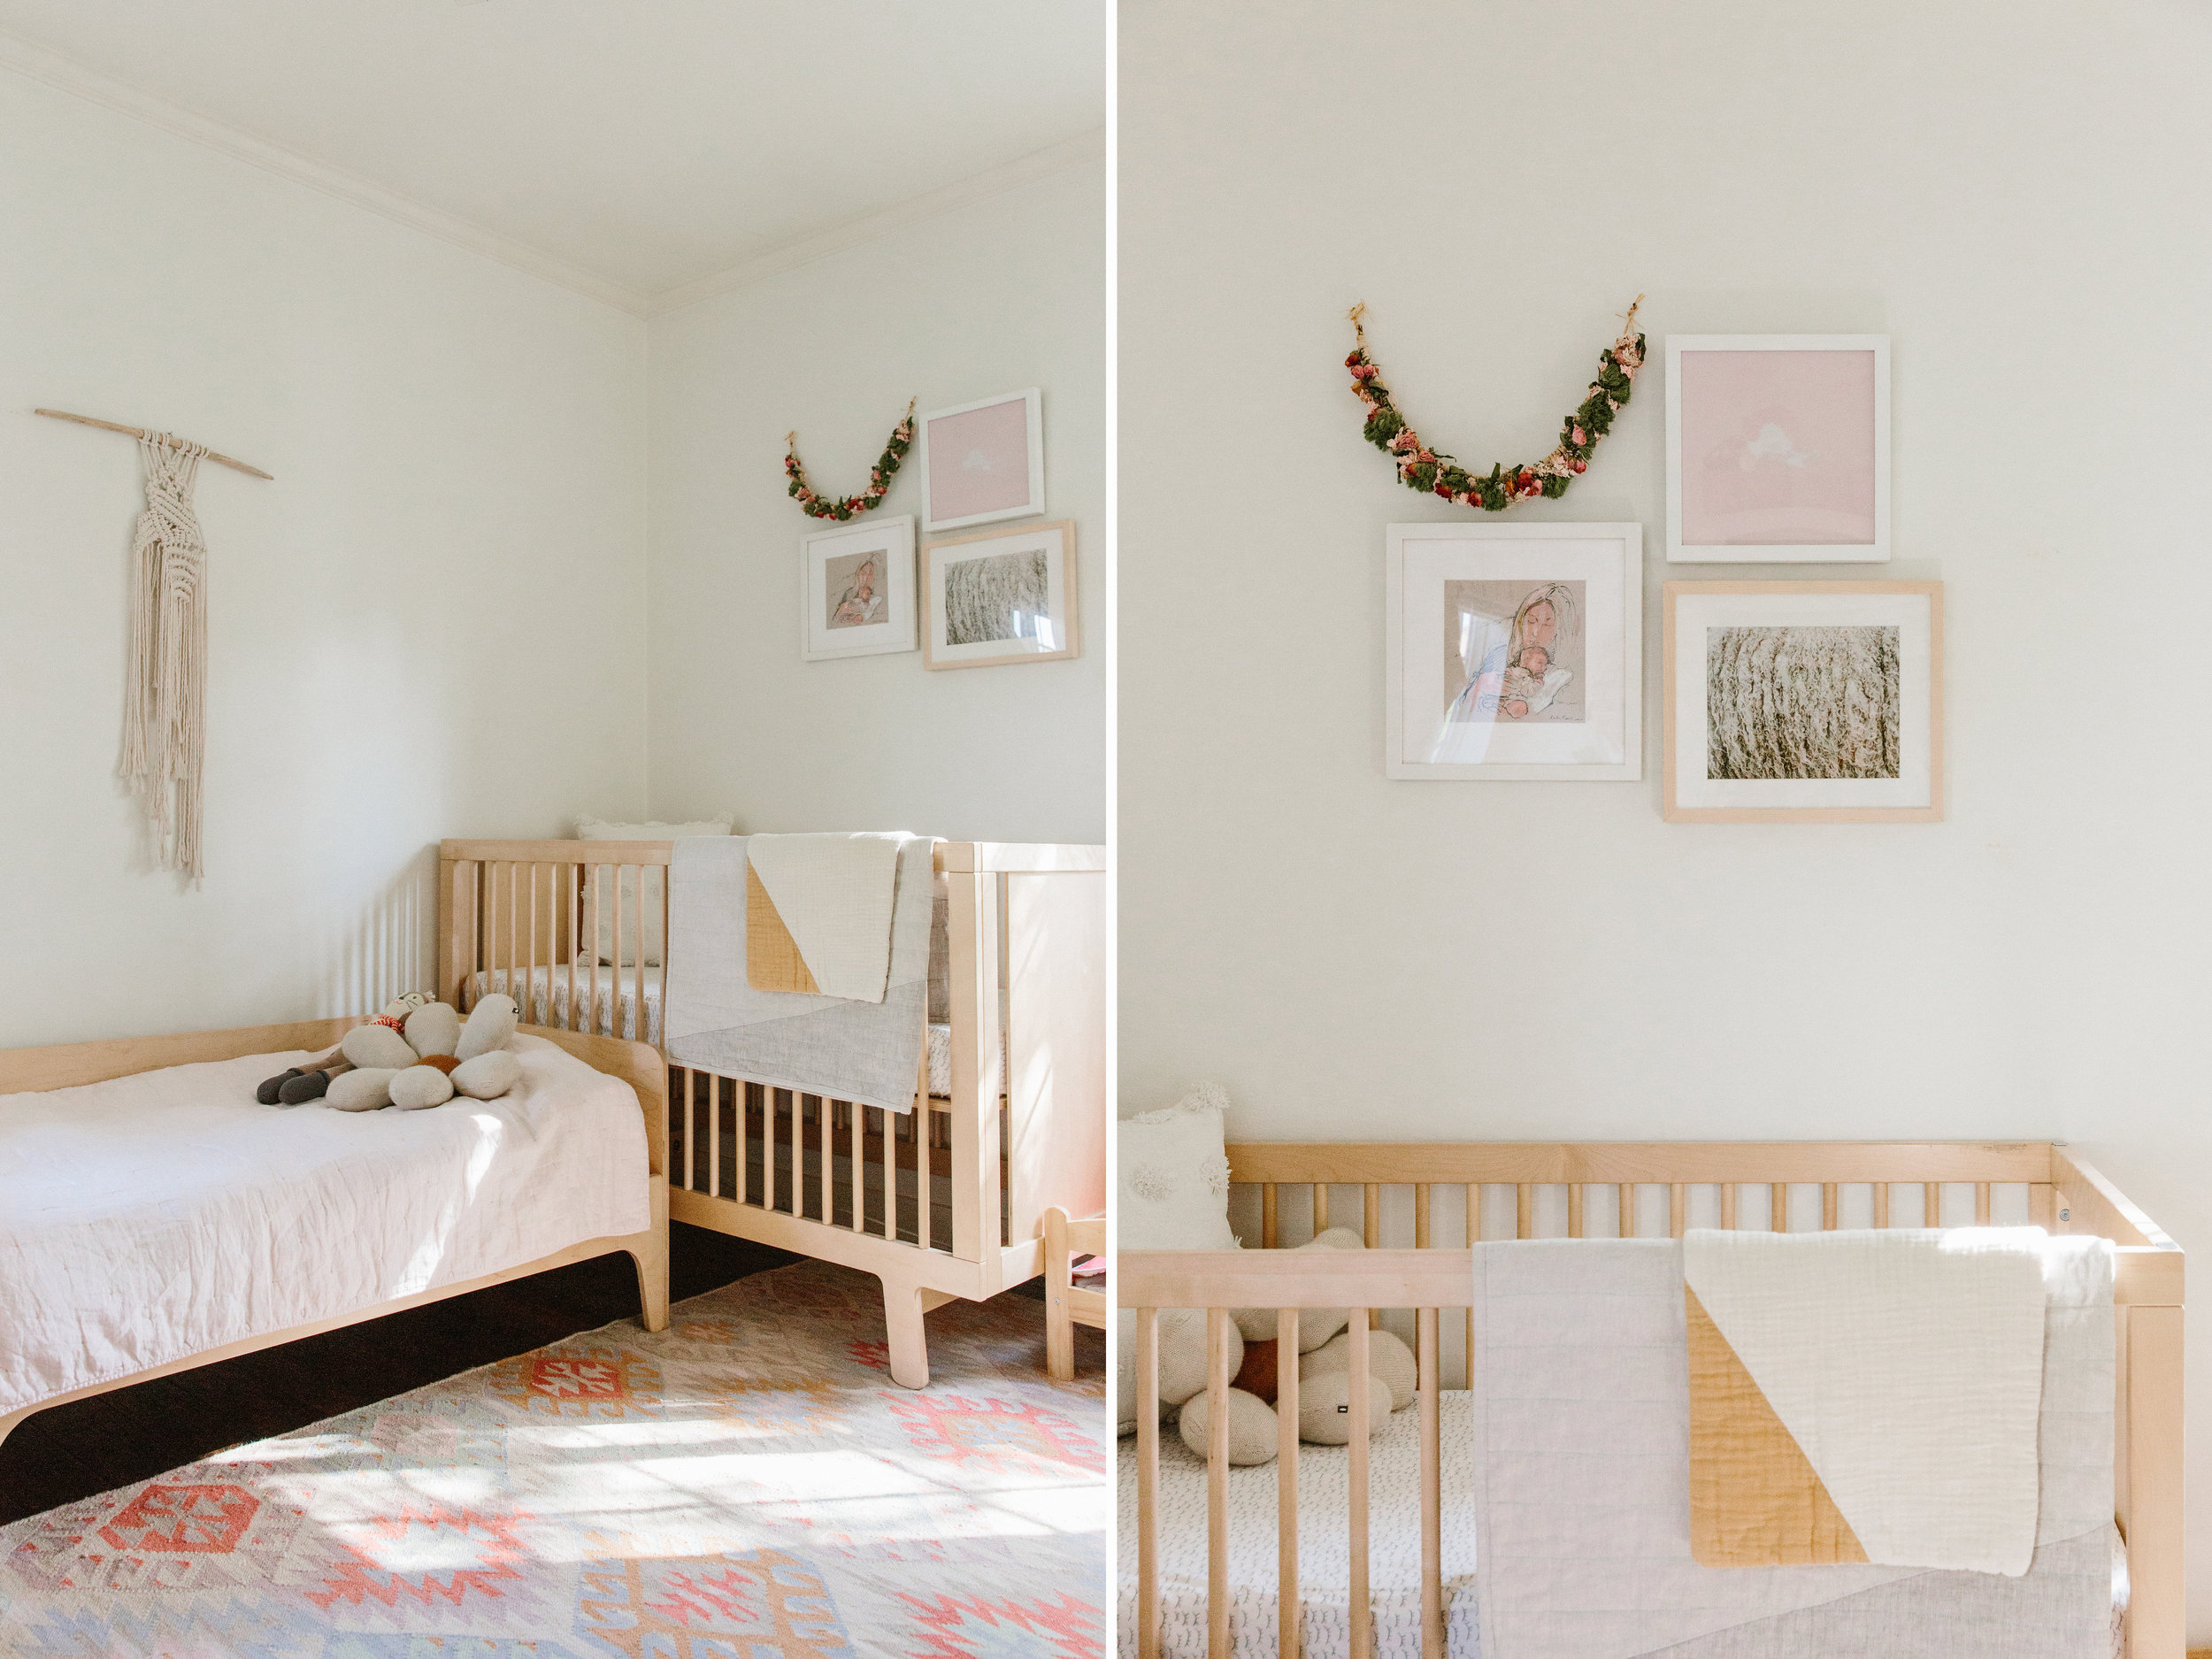 childrens-nursery_girls-shared-room_nicki-sebastian-interior-photography_los-angeles_5.jpg